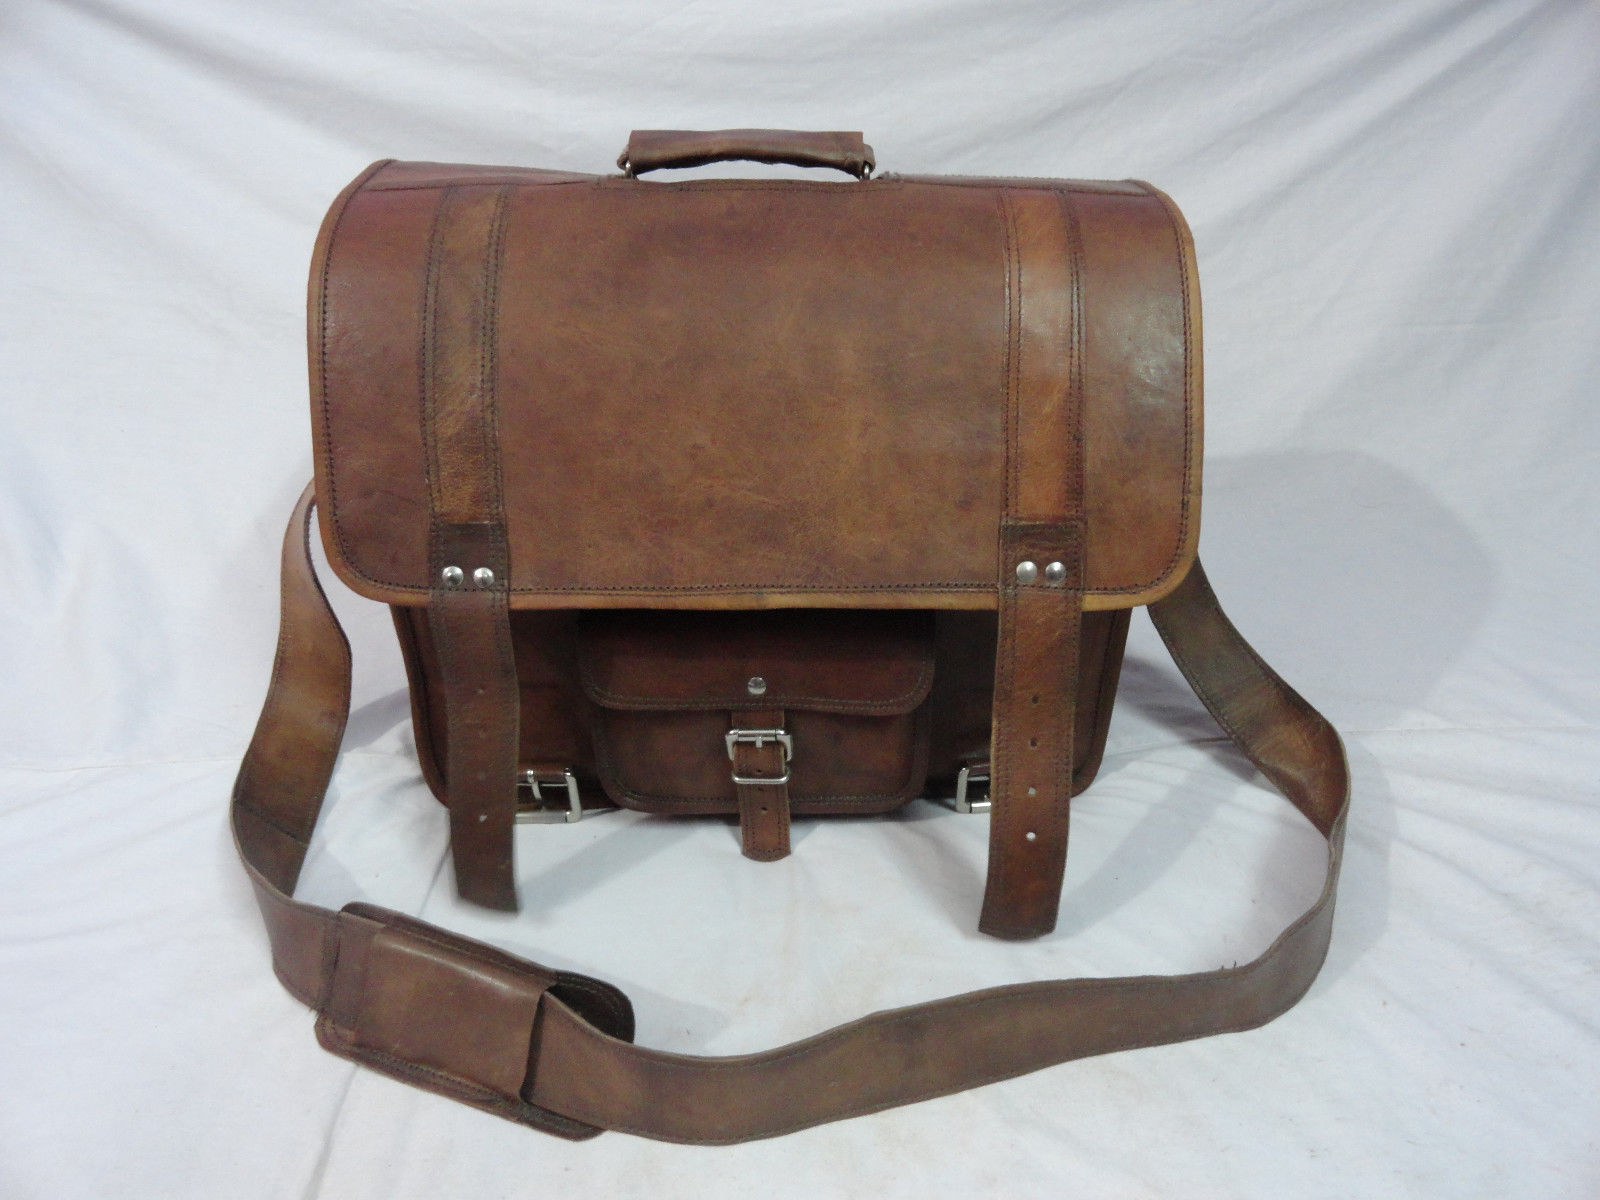 "18x14"" Real Leather Briefcase Laptop Macbook Attache Satchel Suitcase Eco-Friend"